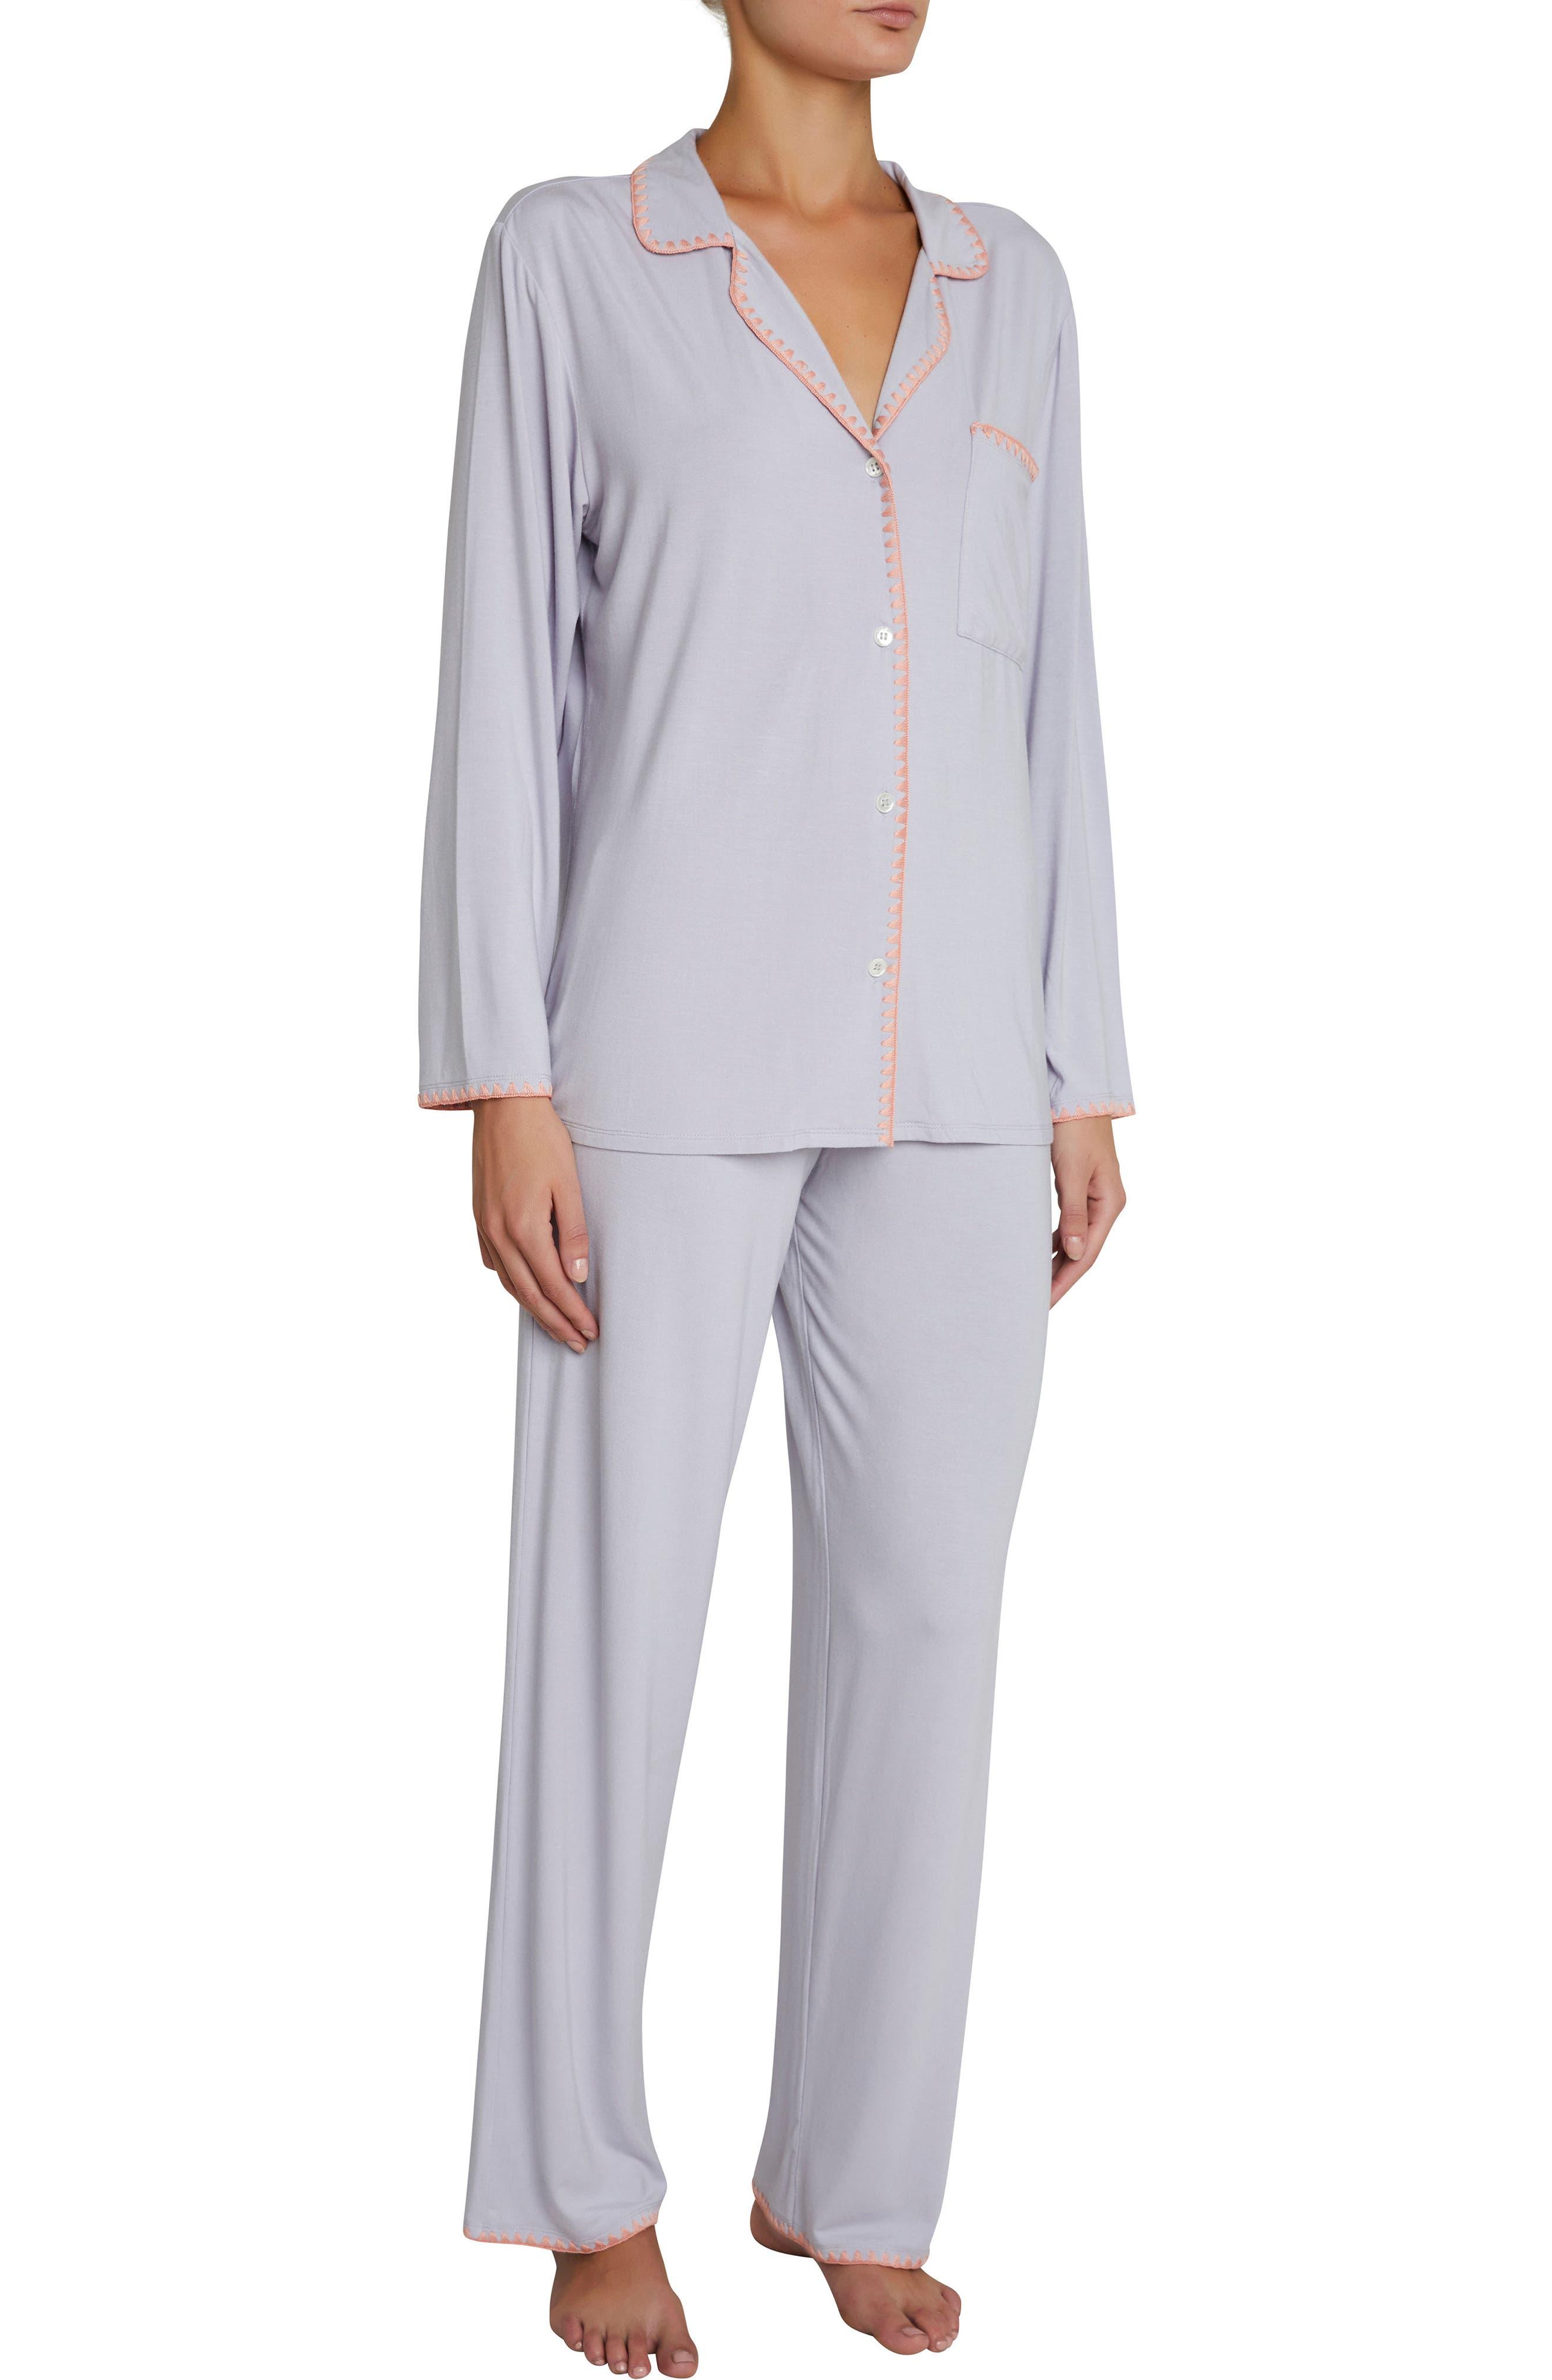 Frida the Whipstitch Pajamas,                             Main thumbnail 1, color,                             Washed Orchid/Melocoton